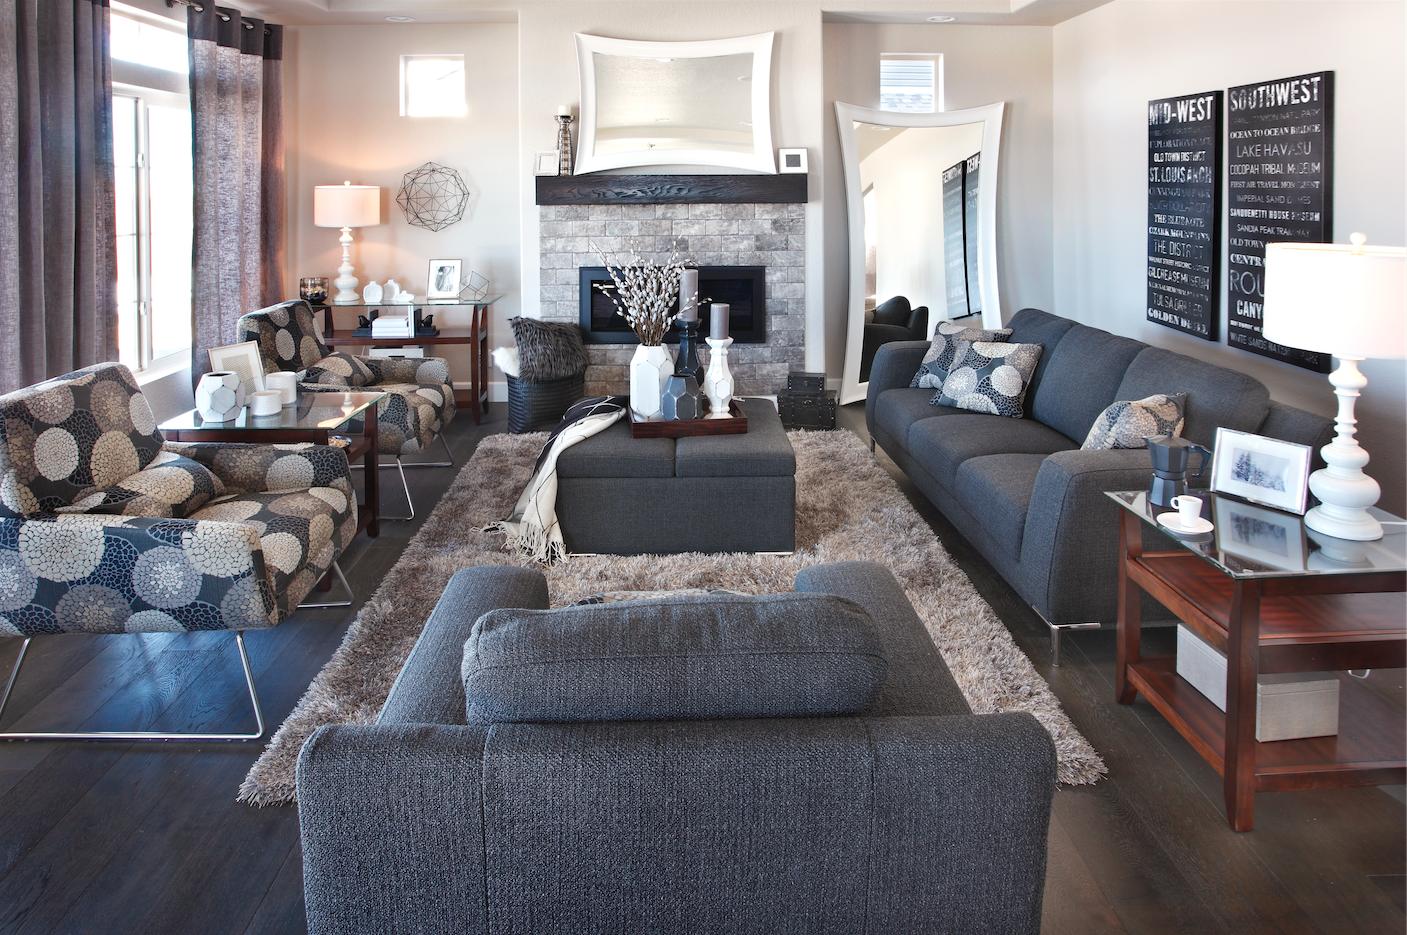 Sofa Mart In North Little Rock Ar Furniture 501 955